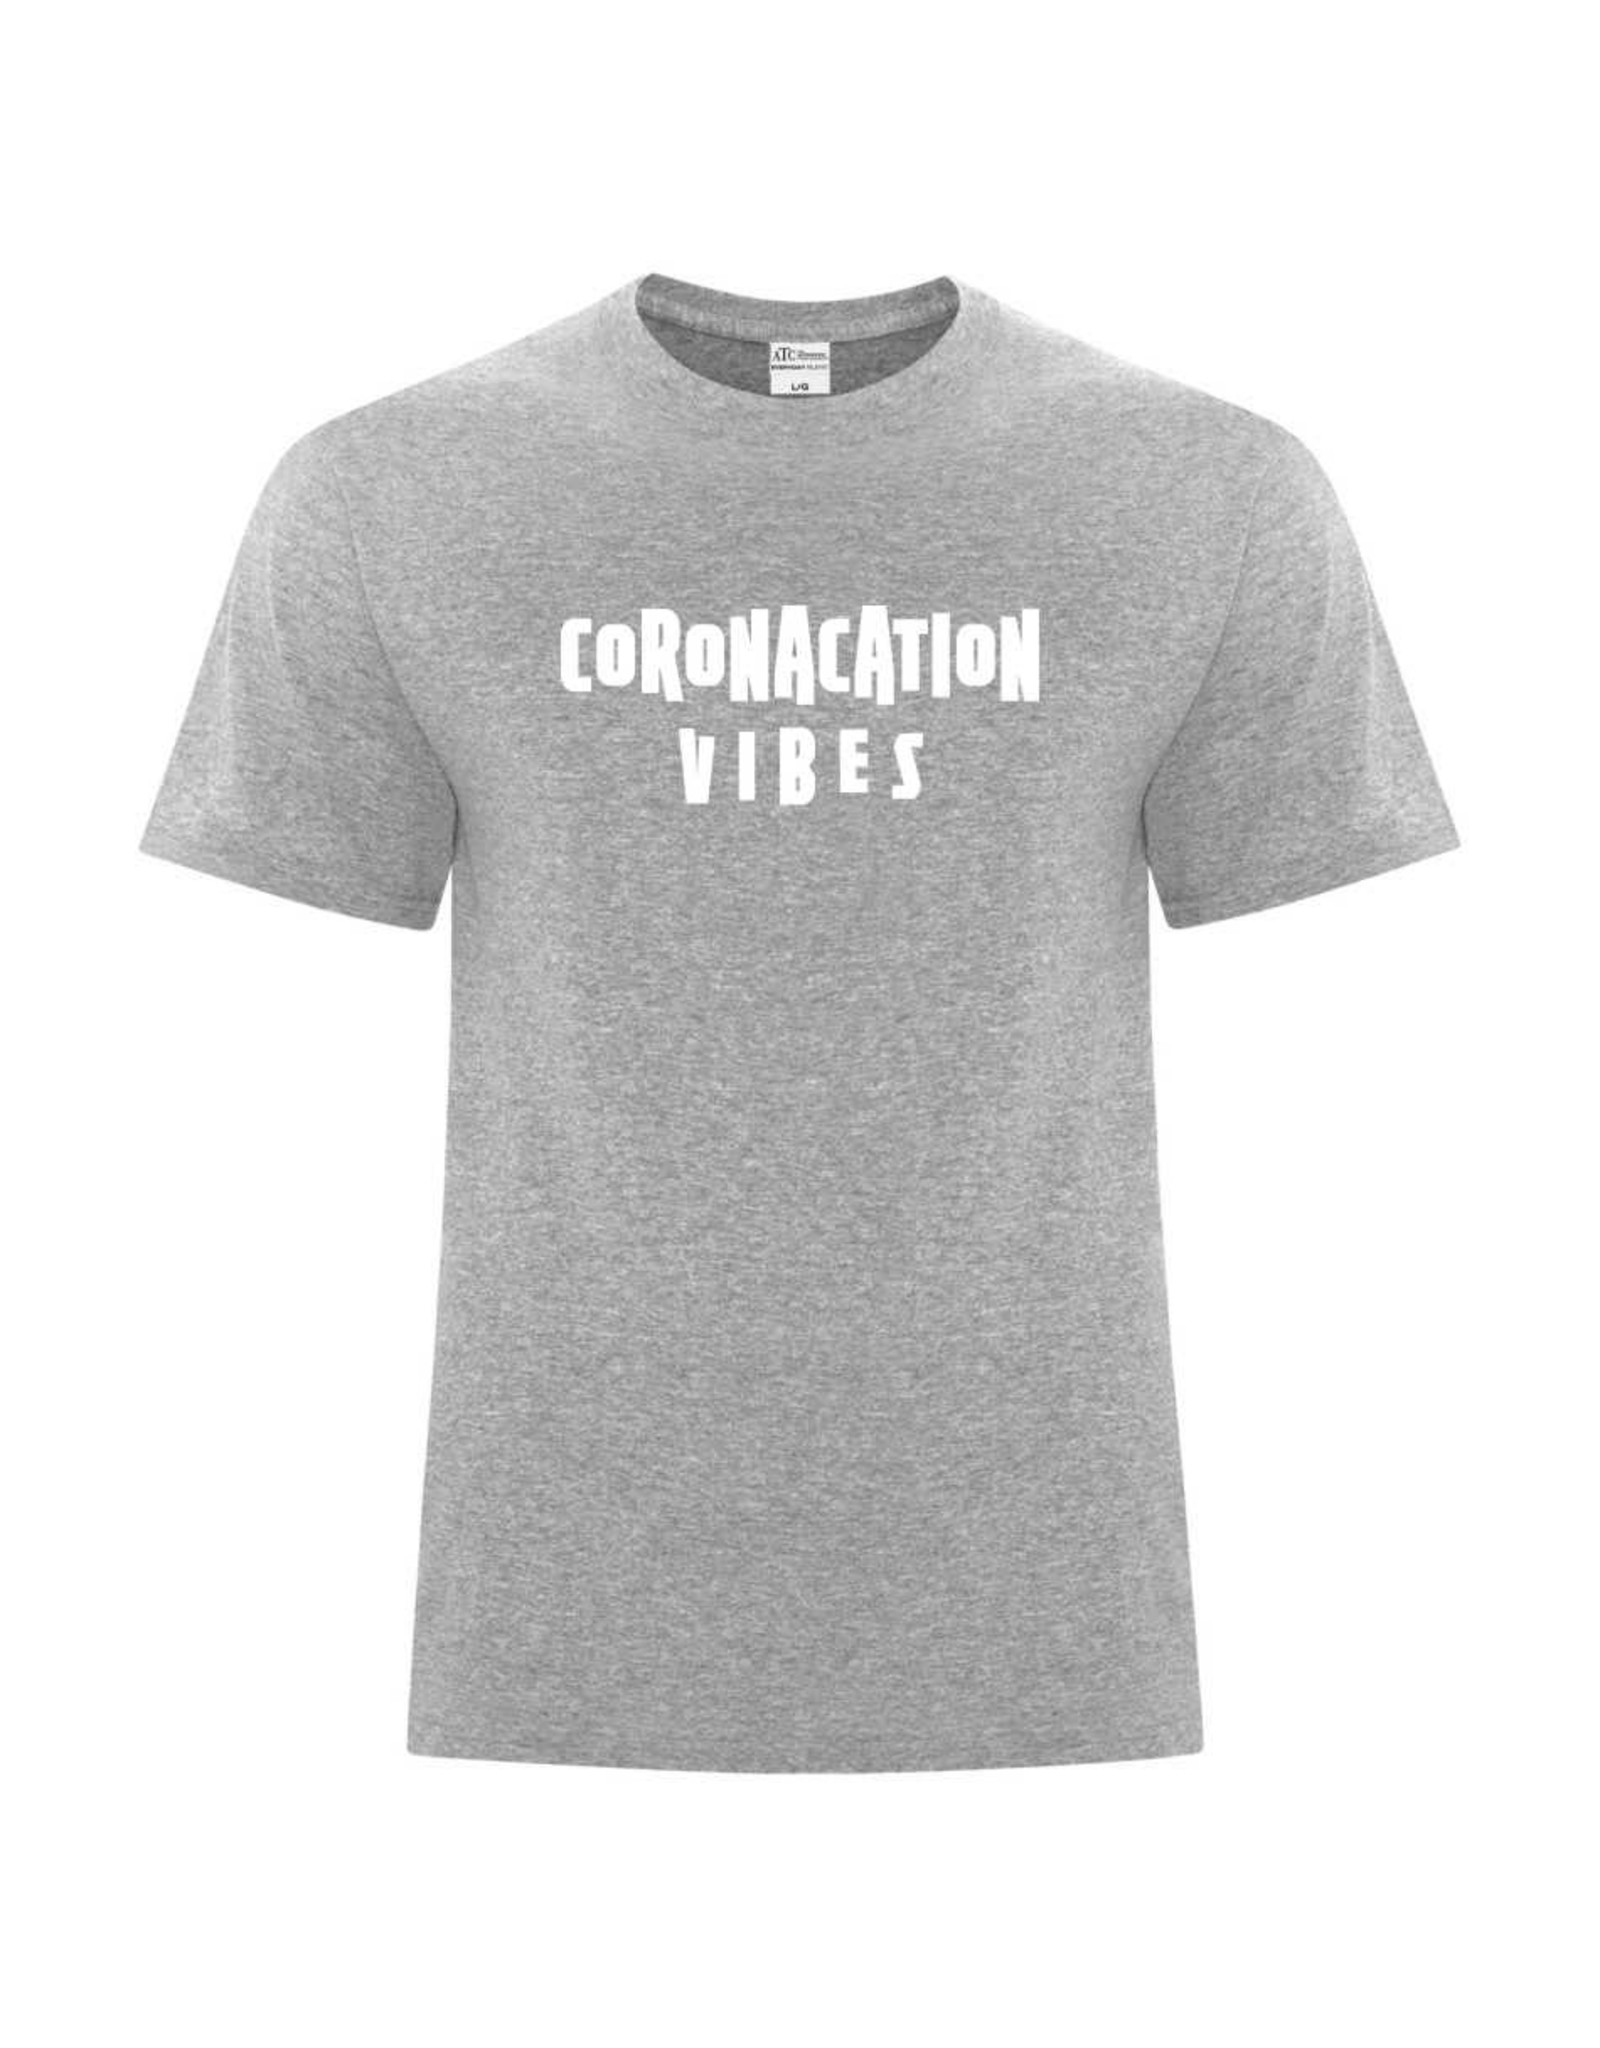 Coronacation Vibes T-Shirt